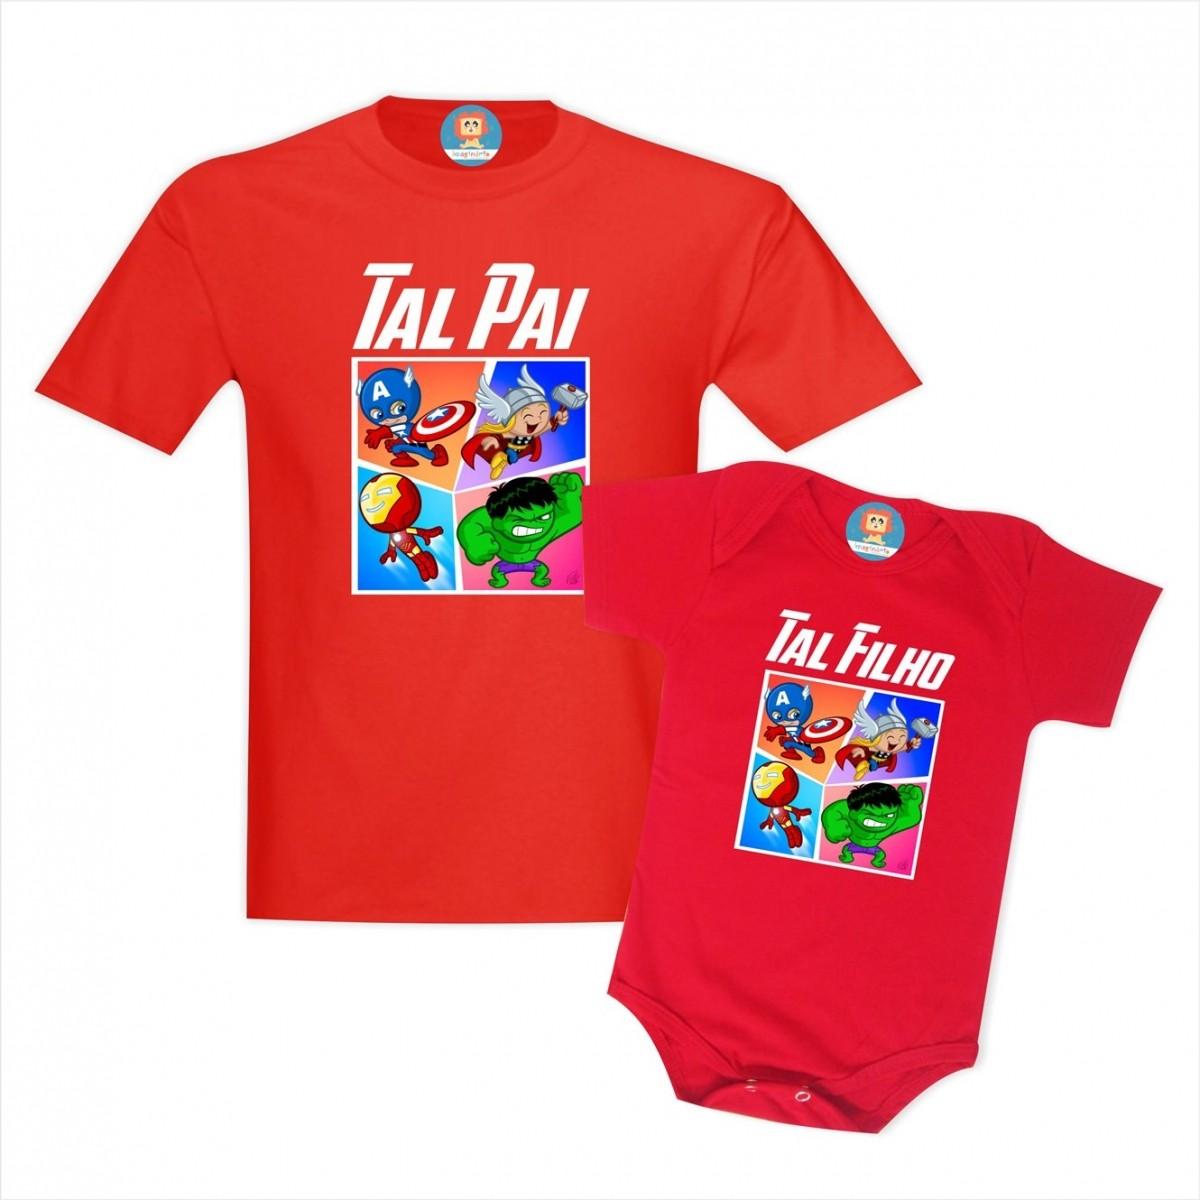 Camisetas Tal Pai Tal Filho(a) Vingadores